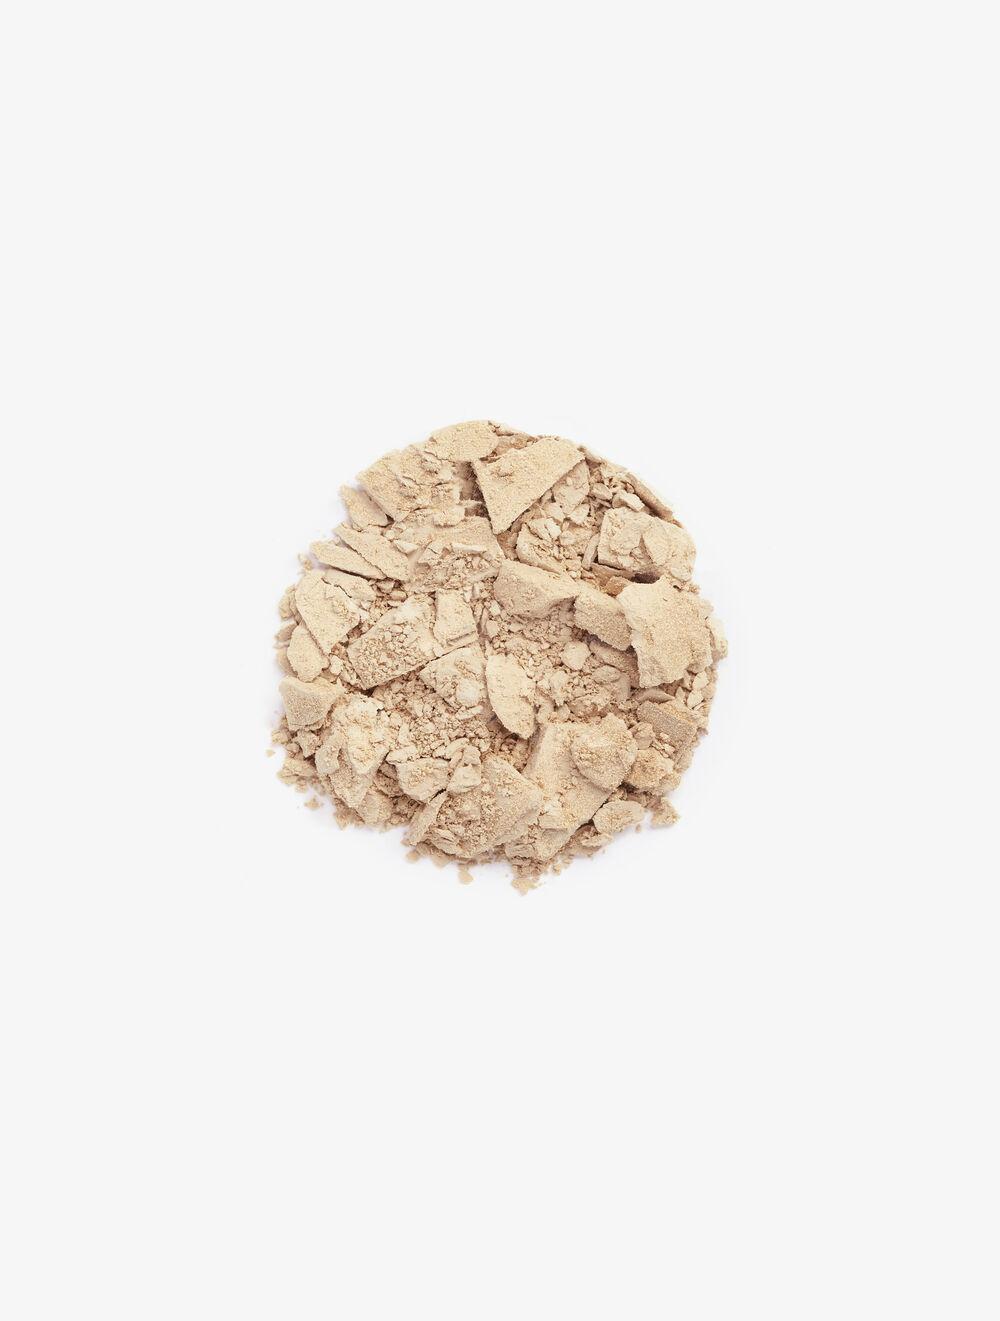 Les Phyto-Ombres 10 Silky Cream